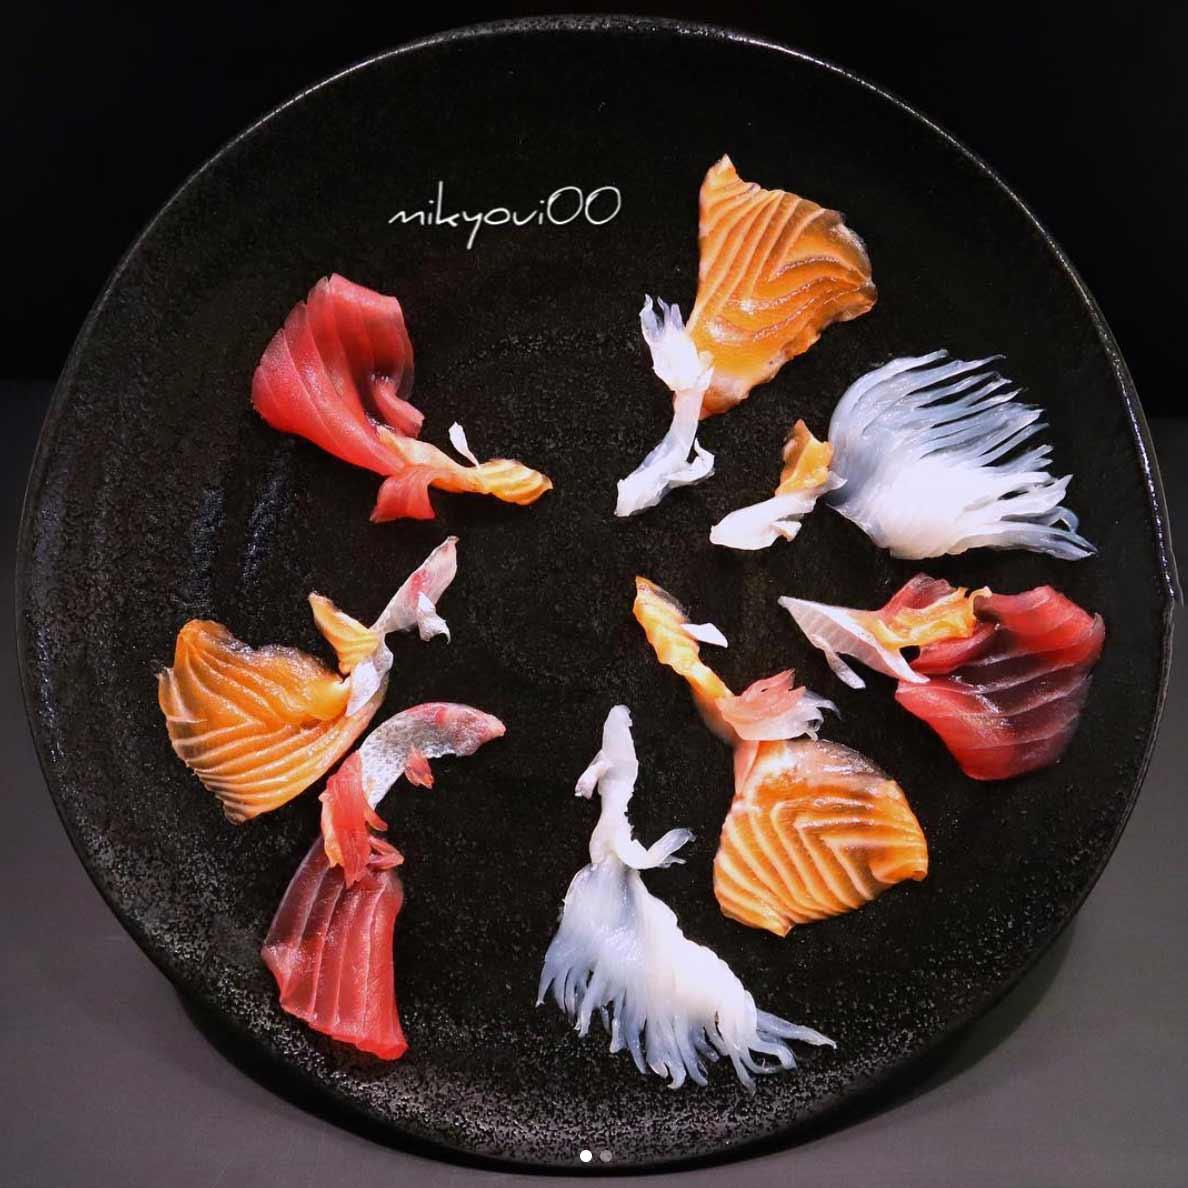 Wundervolle Sashimi-Kunstwerke von mikyou mikyou-sashimi-art-sushi-fischbilder_13